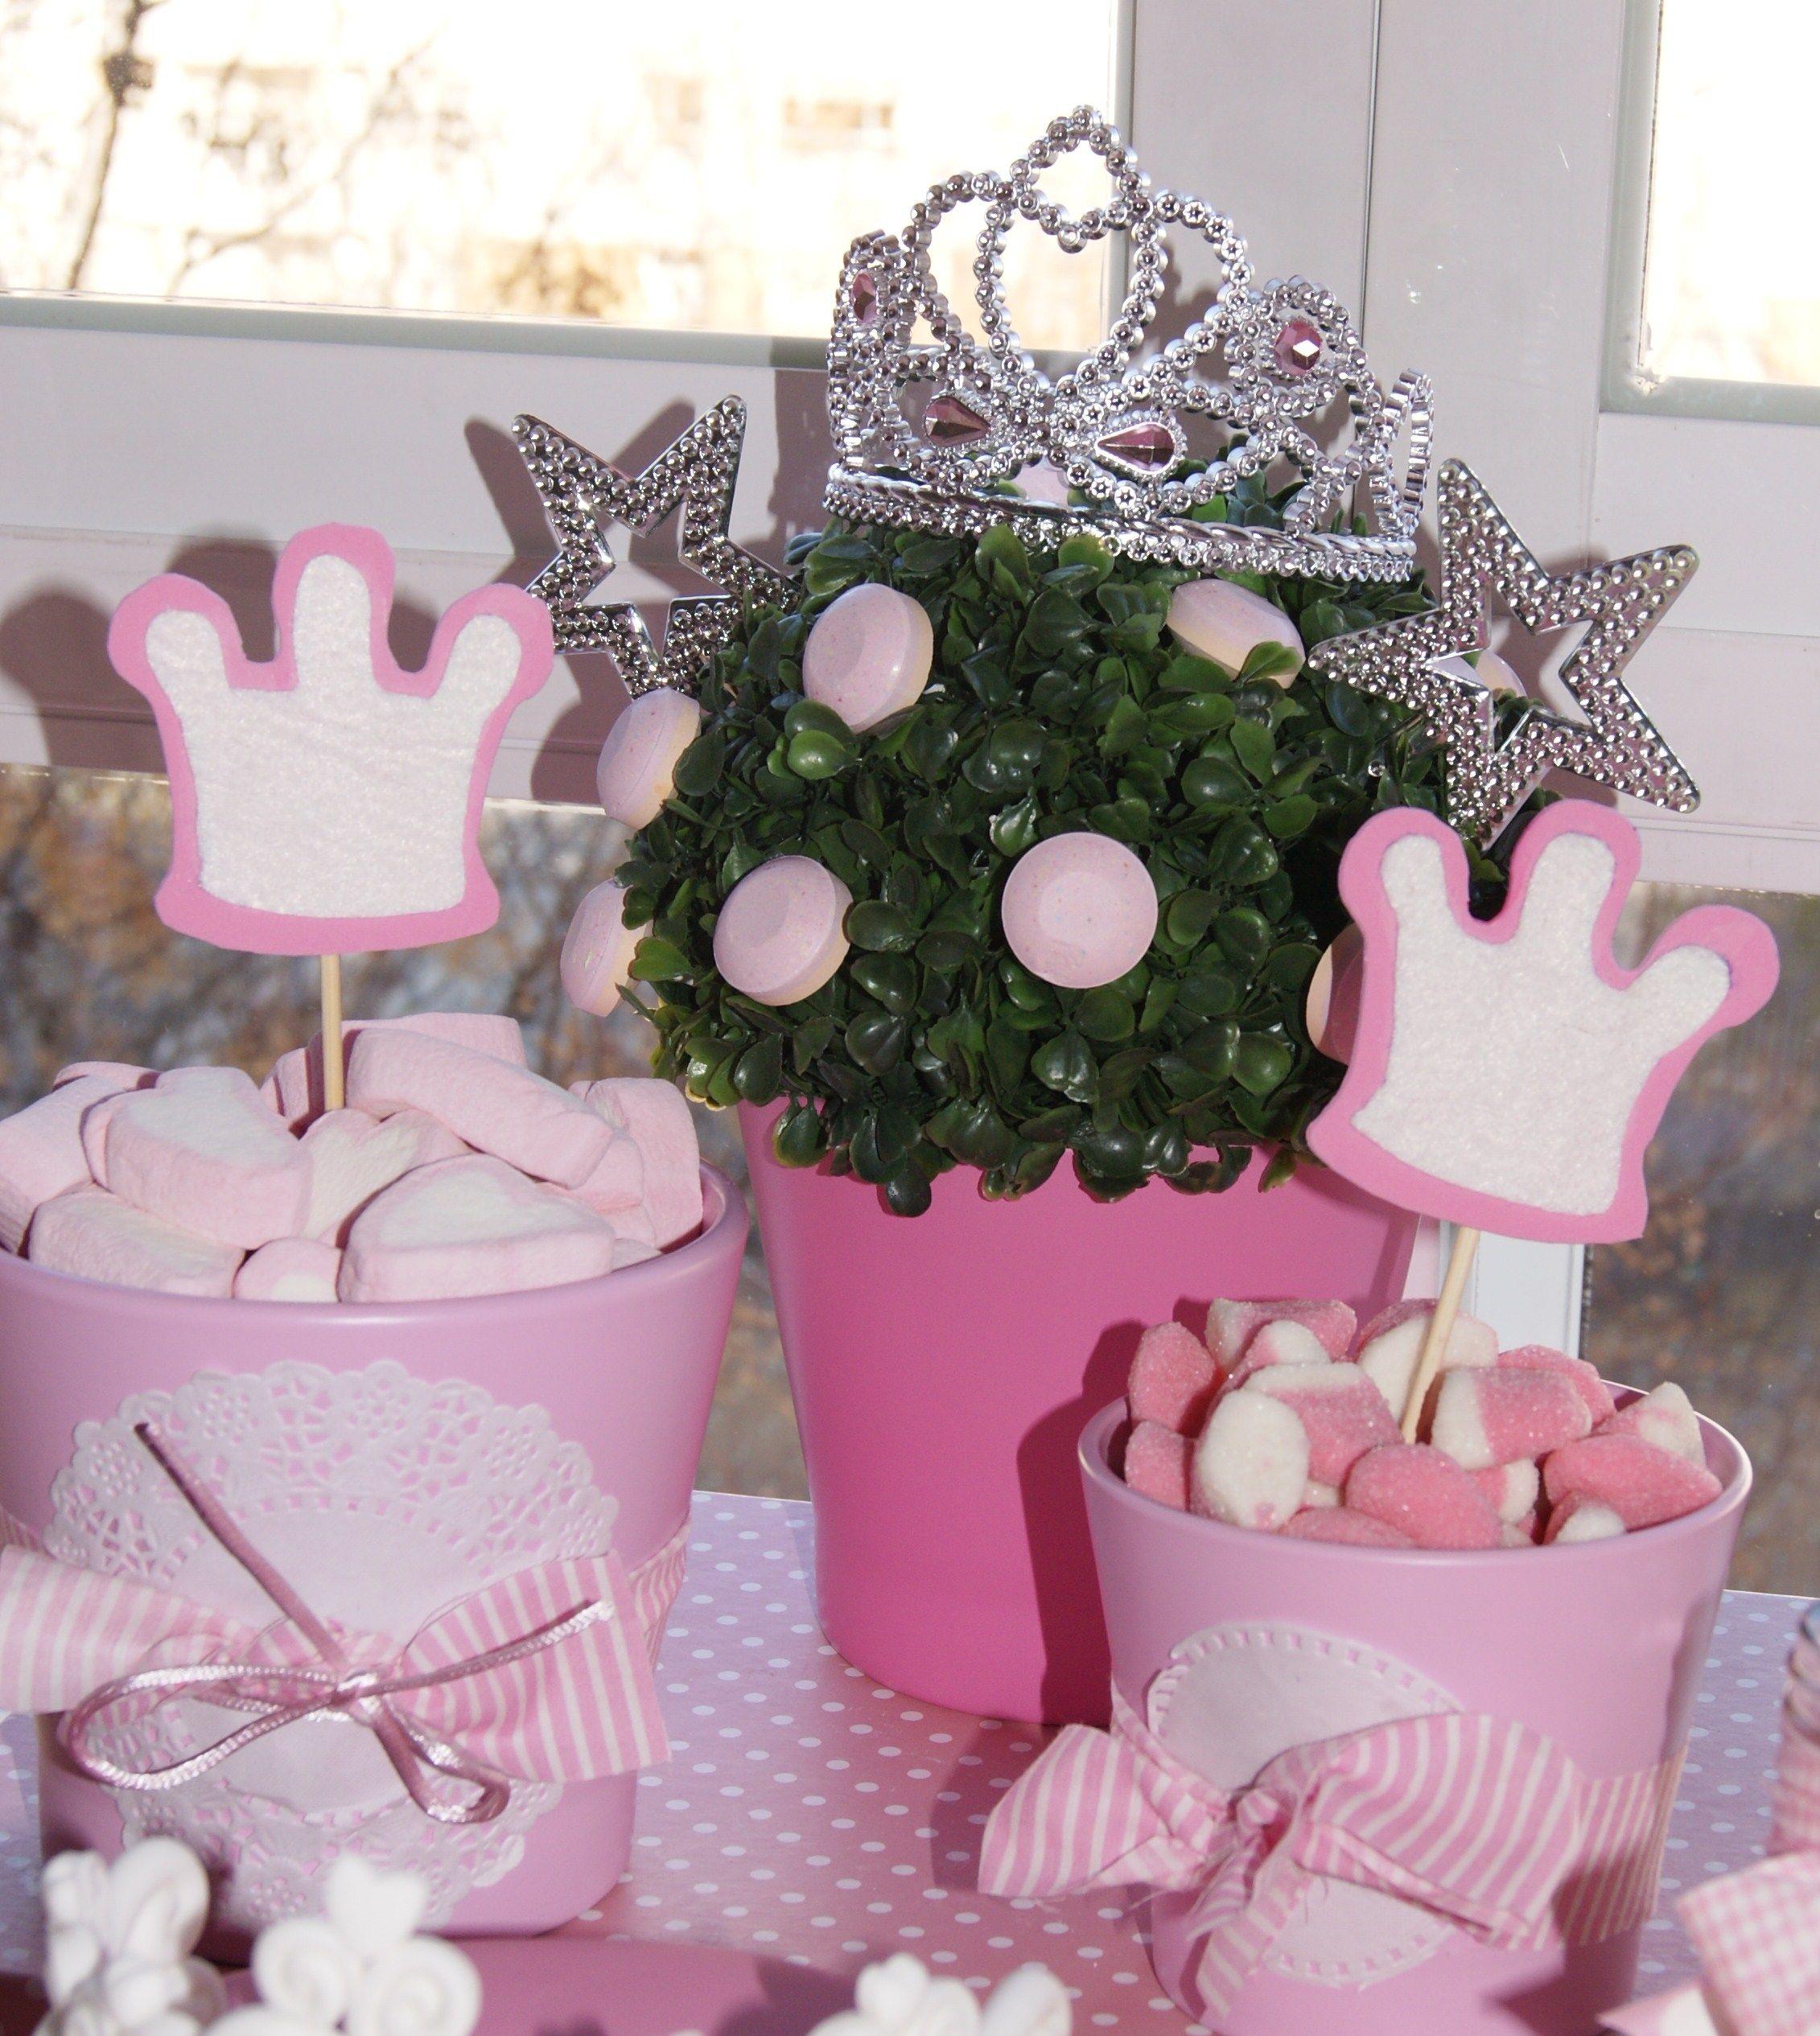 Bonitos detalles para decorar cumplea os de princesas - Fiestas de cumpleanos de princesas ...